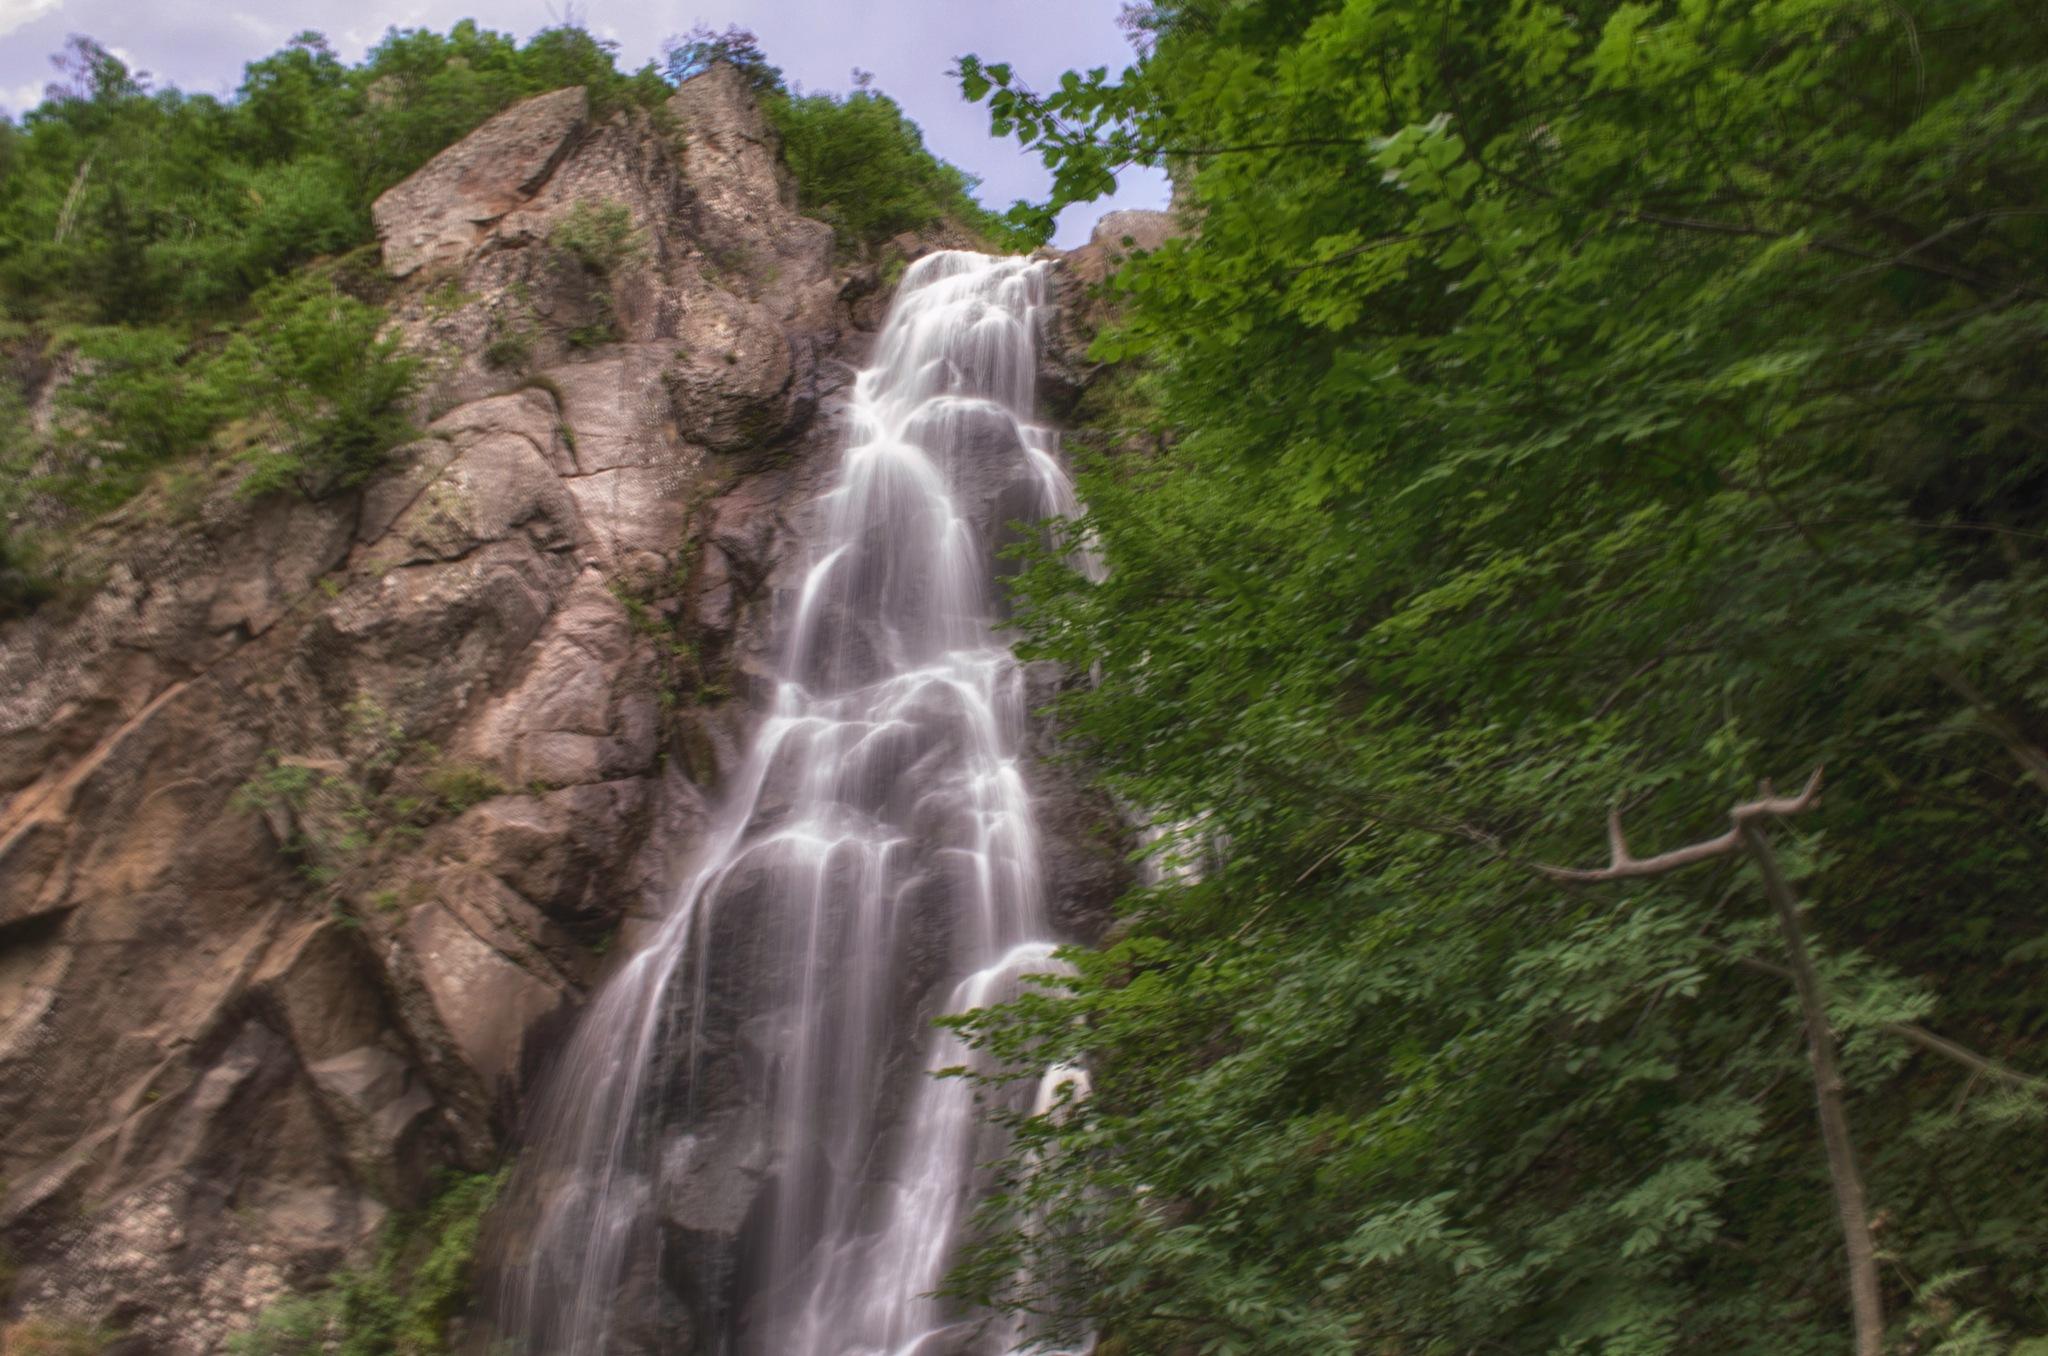 Waterfall II by Stathis Karatzas